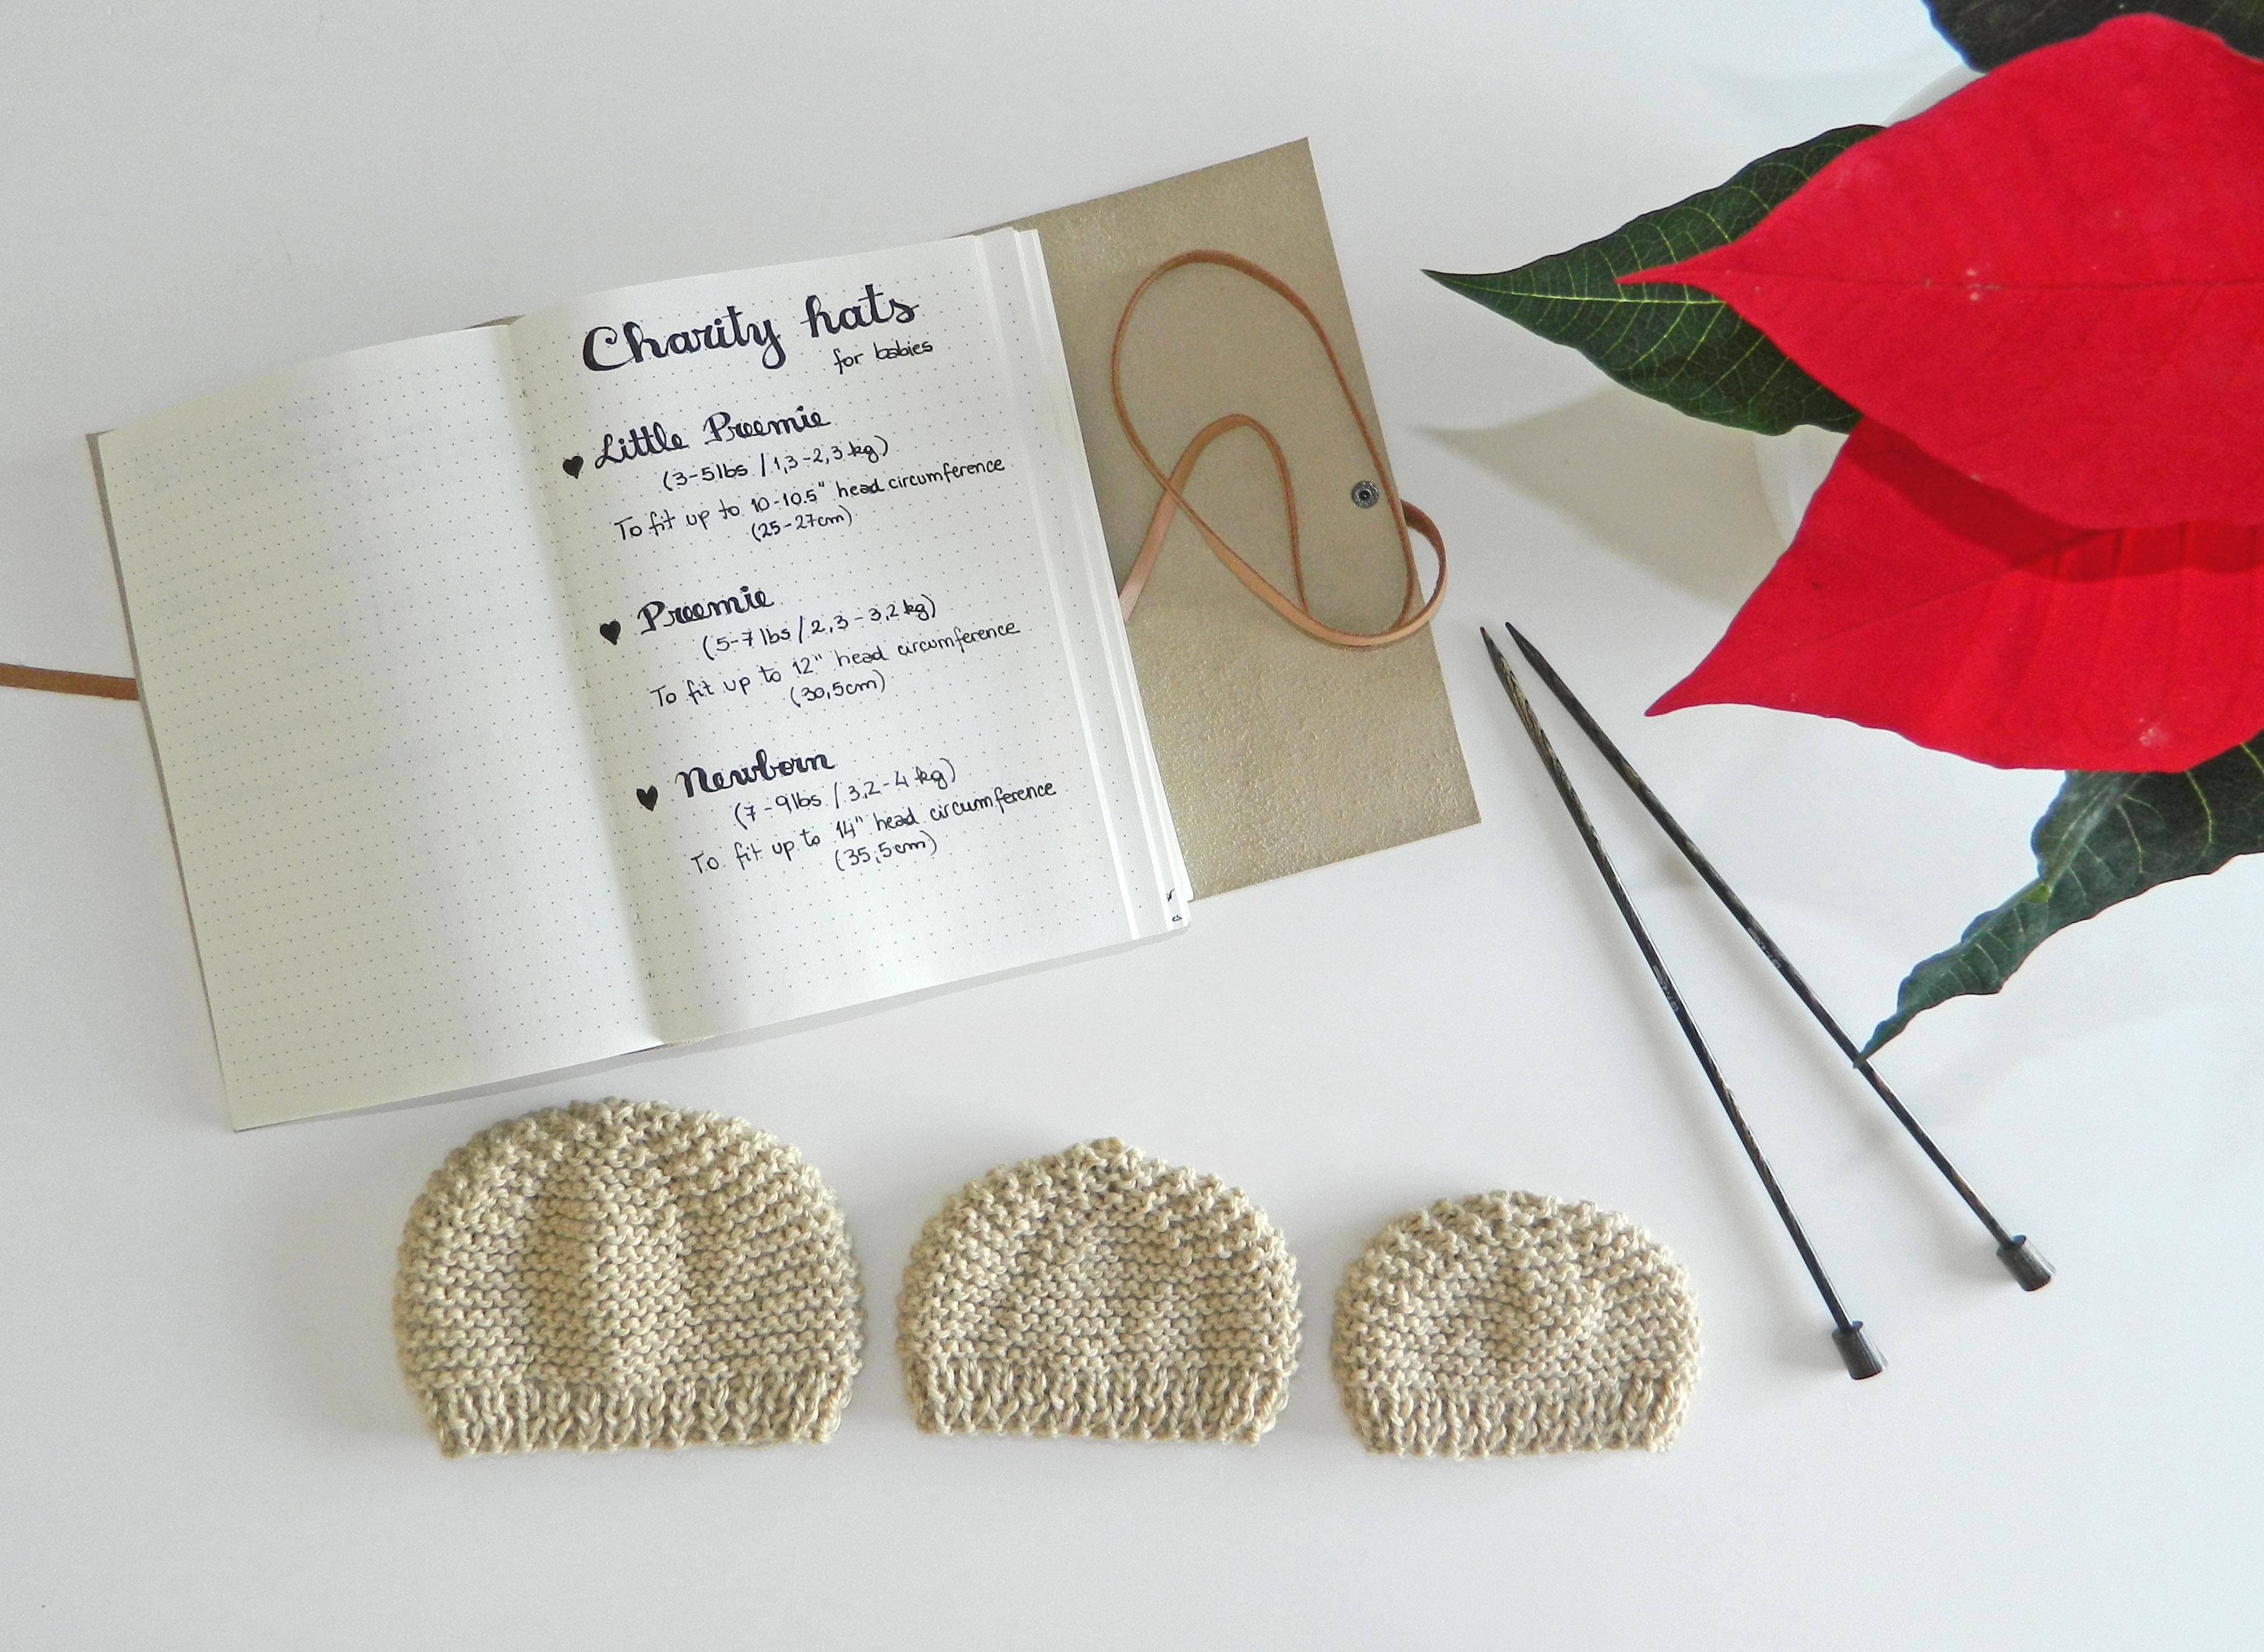 Charity Hats for Babies (preemies and newborns)